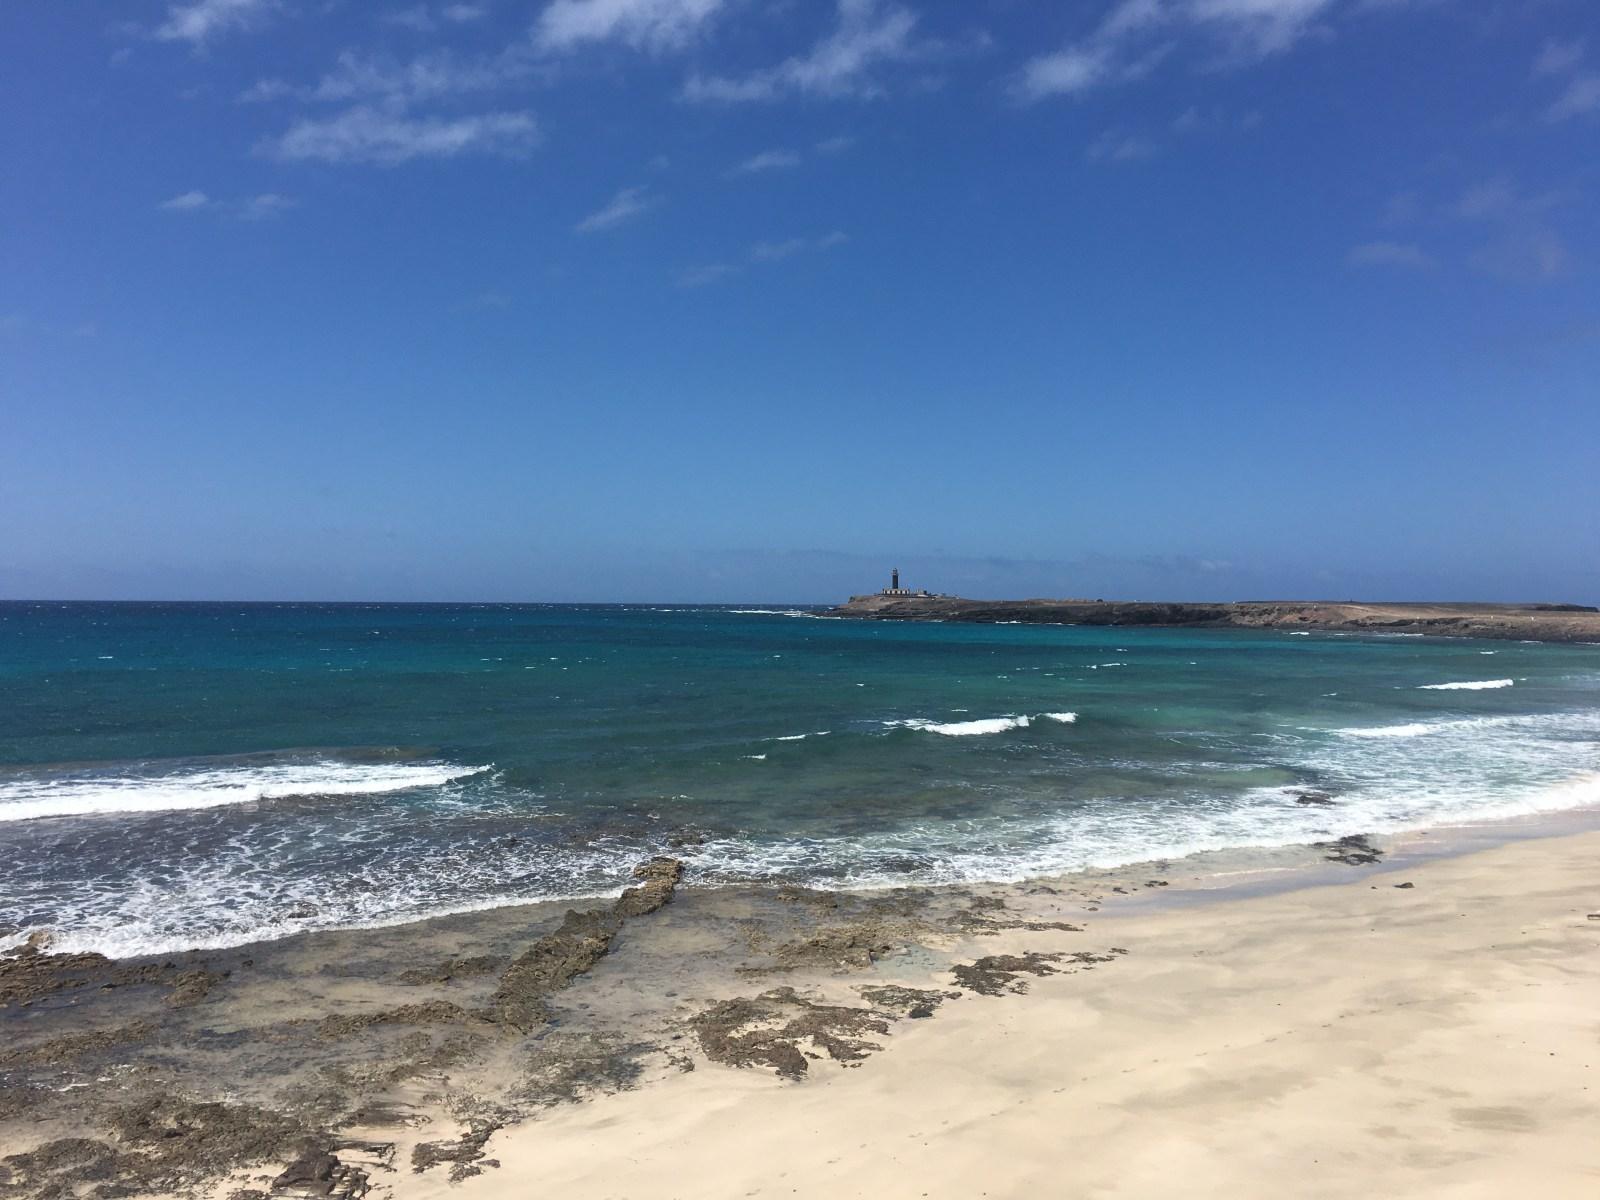 Noleggio Barche Faro de Punta Jandia - Navalia | Noleggia un Sogno